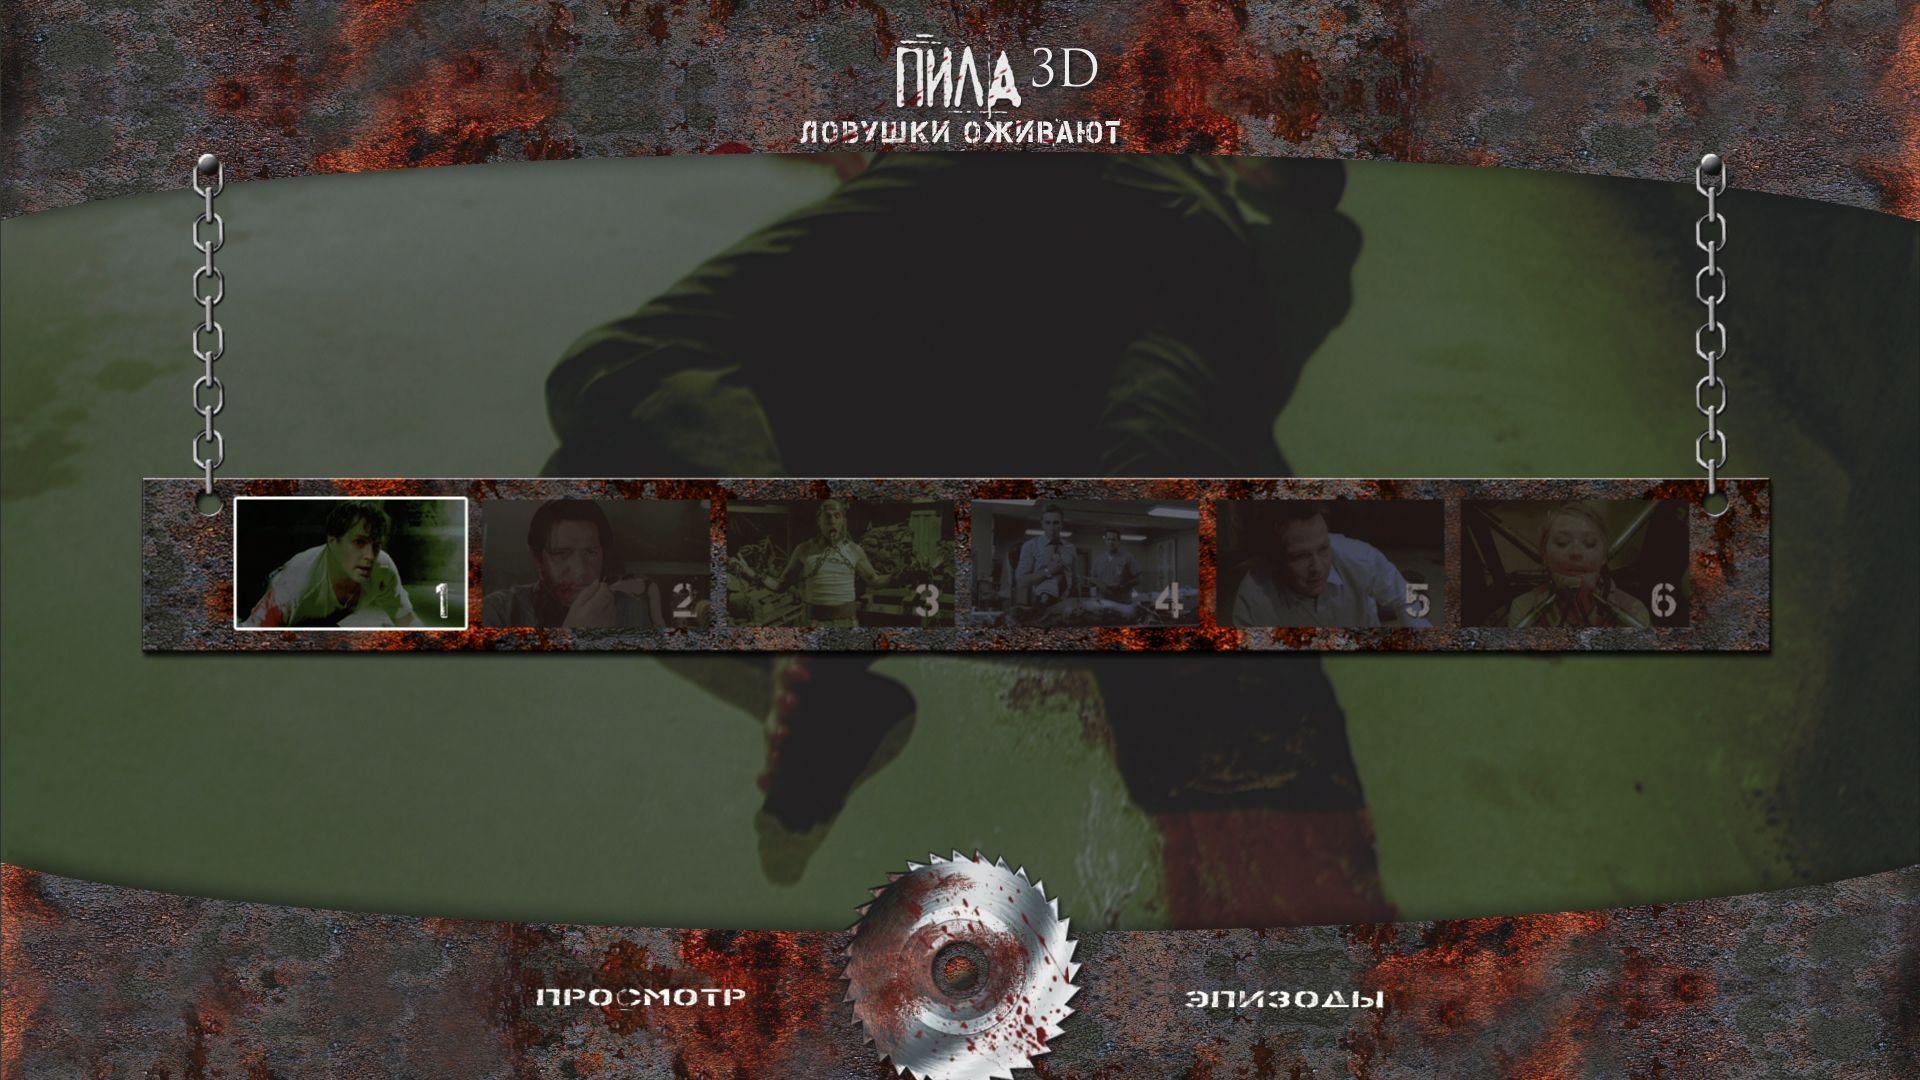 http://i5.imageban.ru/out/2012/12/01/0ea8b31870ffa96f7bc10618be5ae63d.jpg